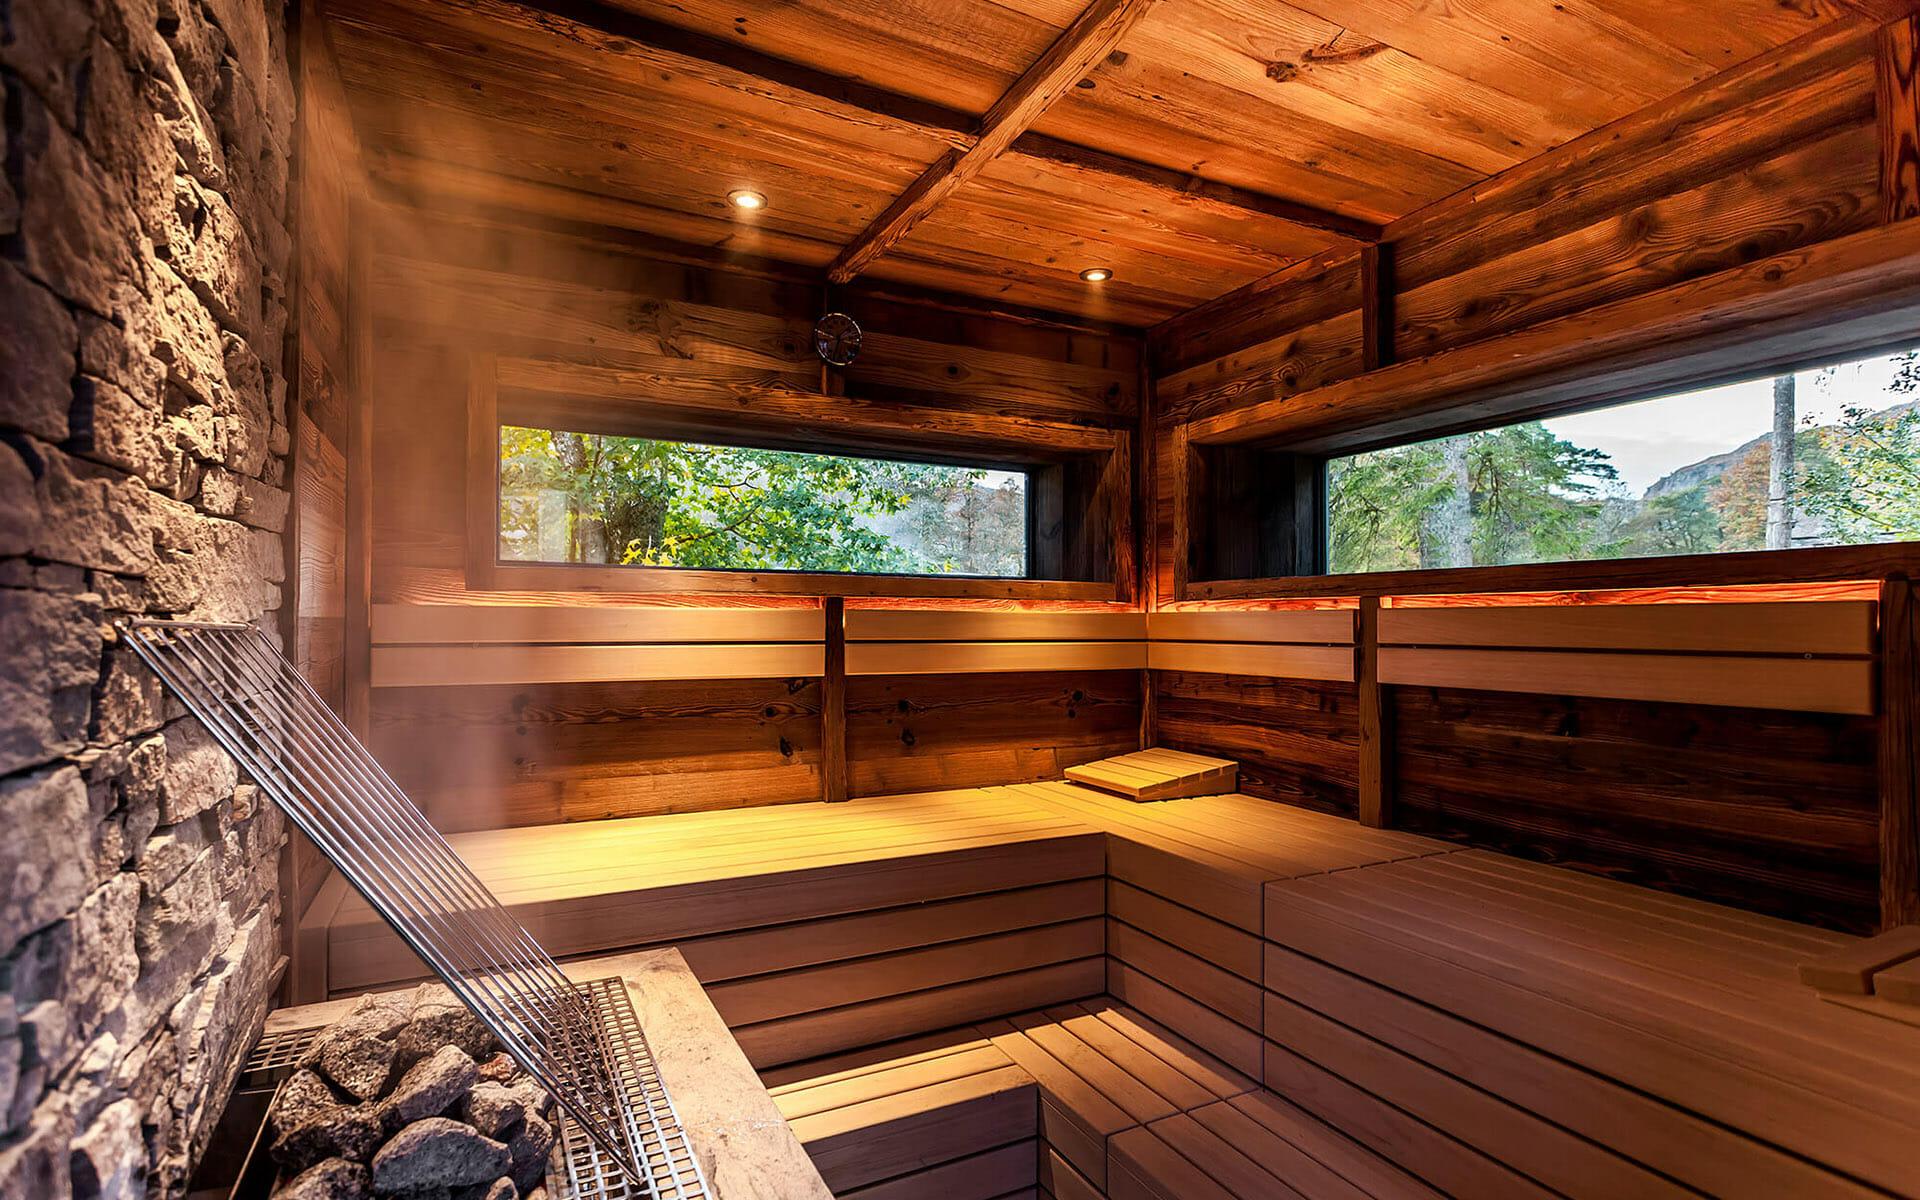 Top 15 Infrared Sauna Tips - Best Sauna Heater